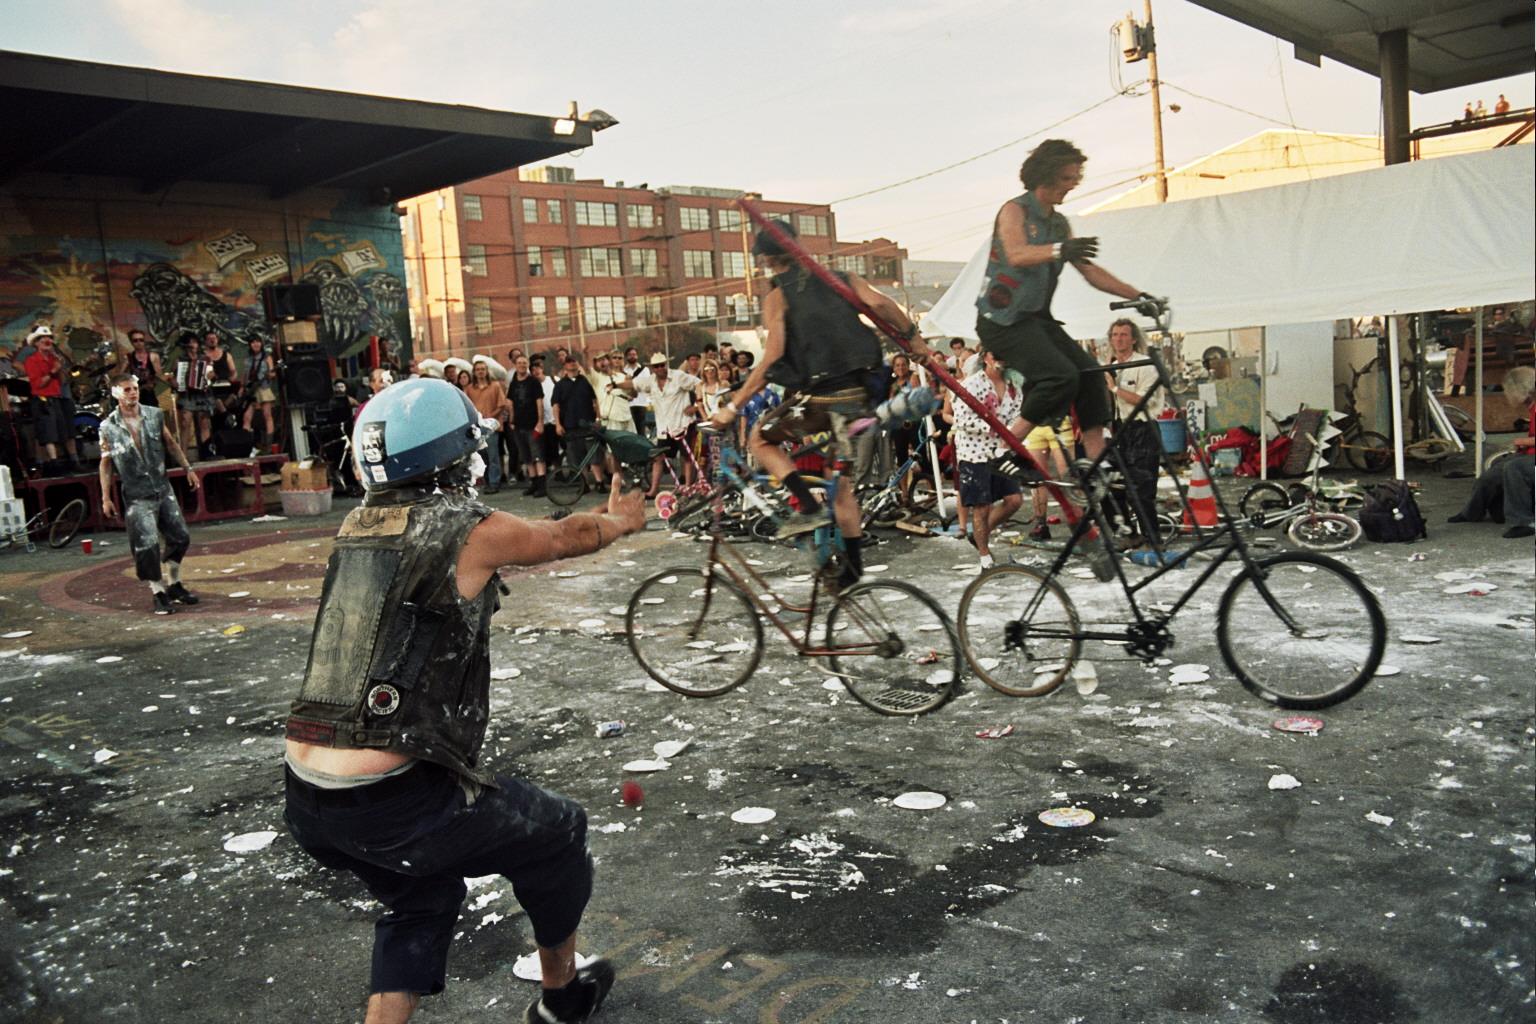 Tall Bike Jousting by Angela Scrivani